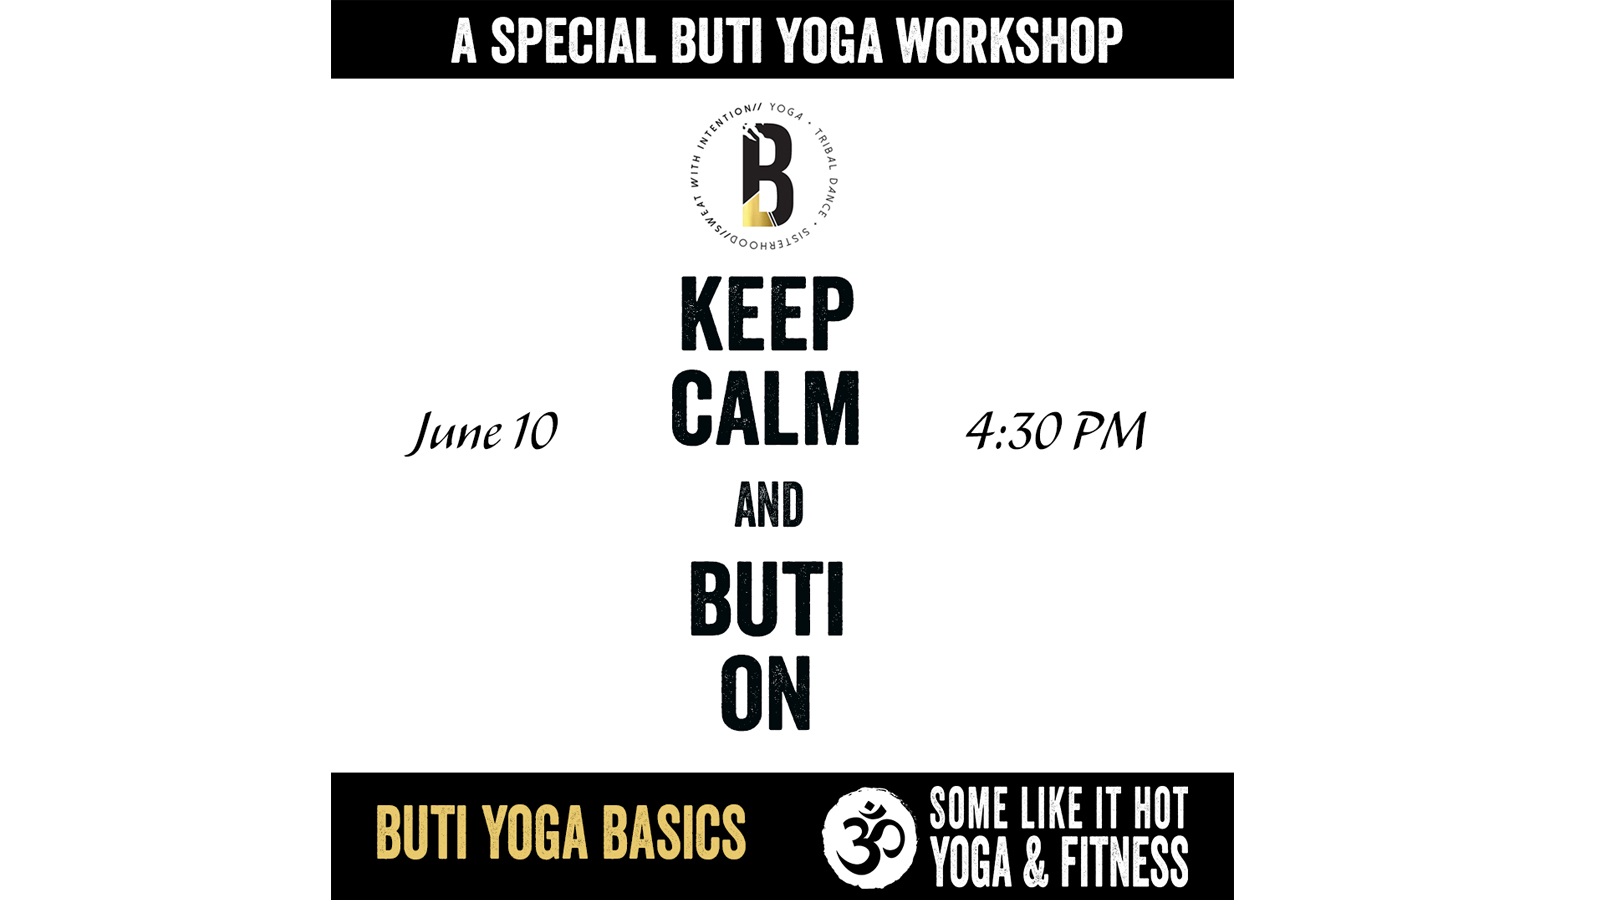 buti yoga basics.jpg